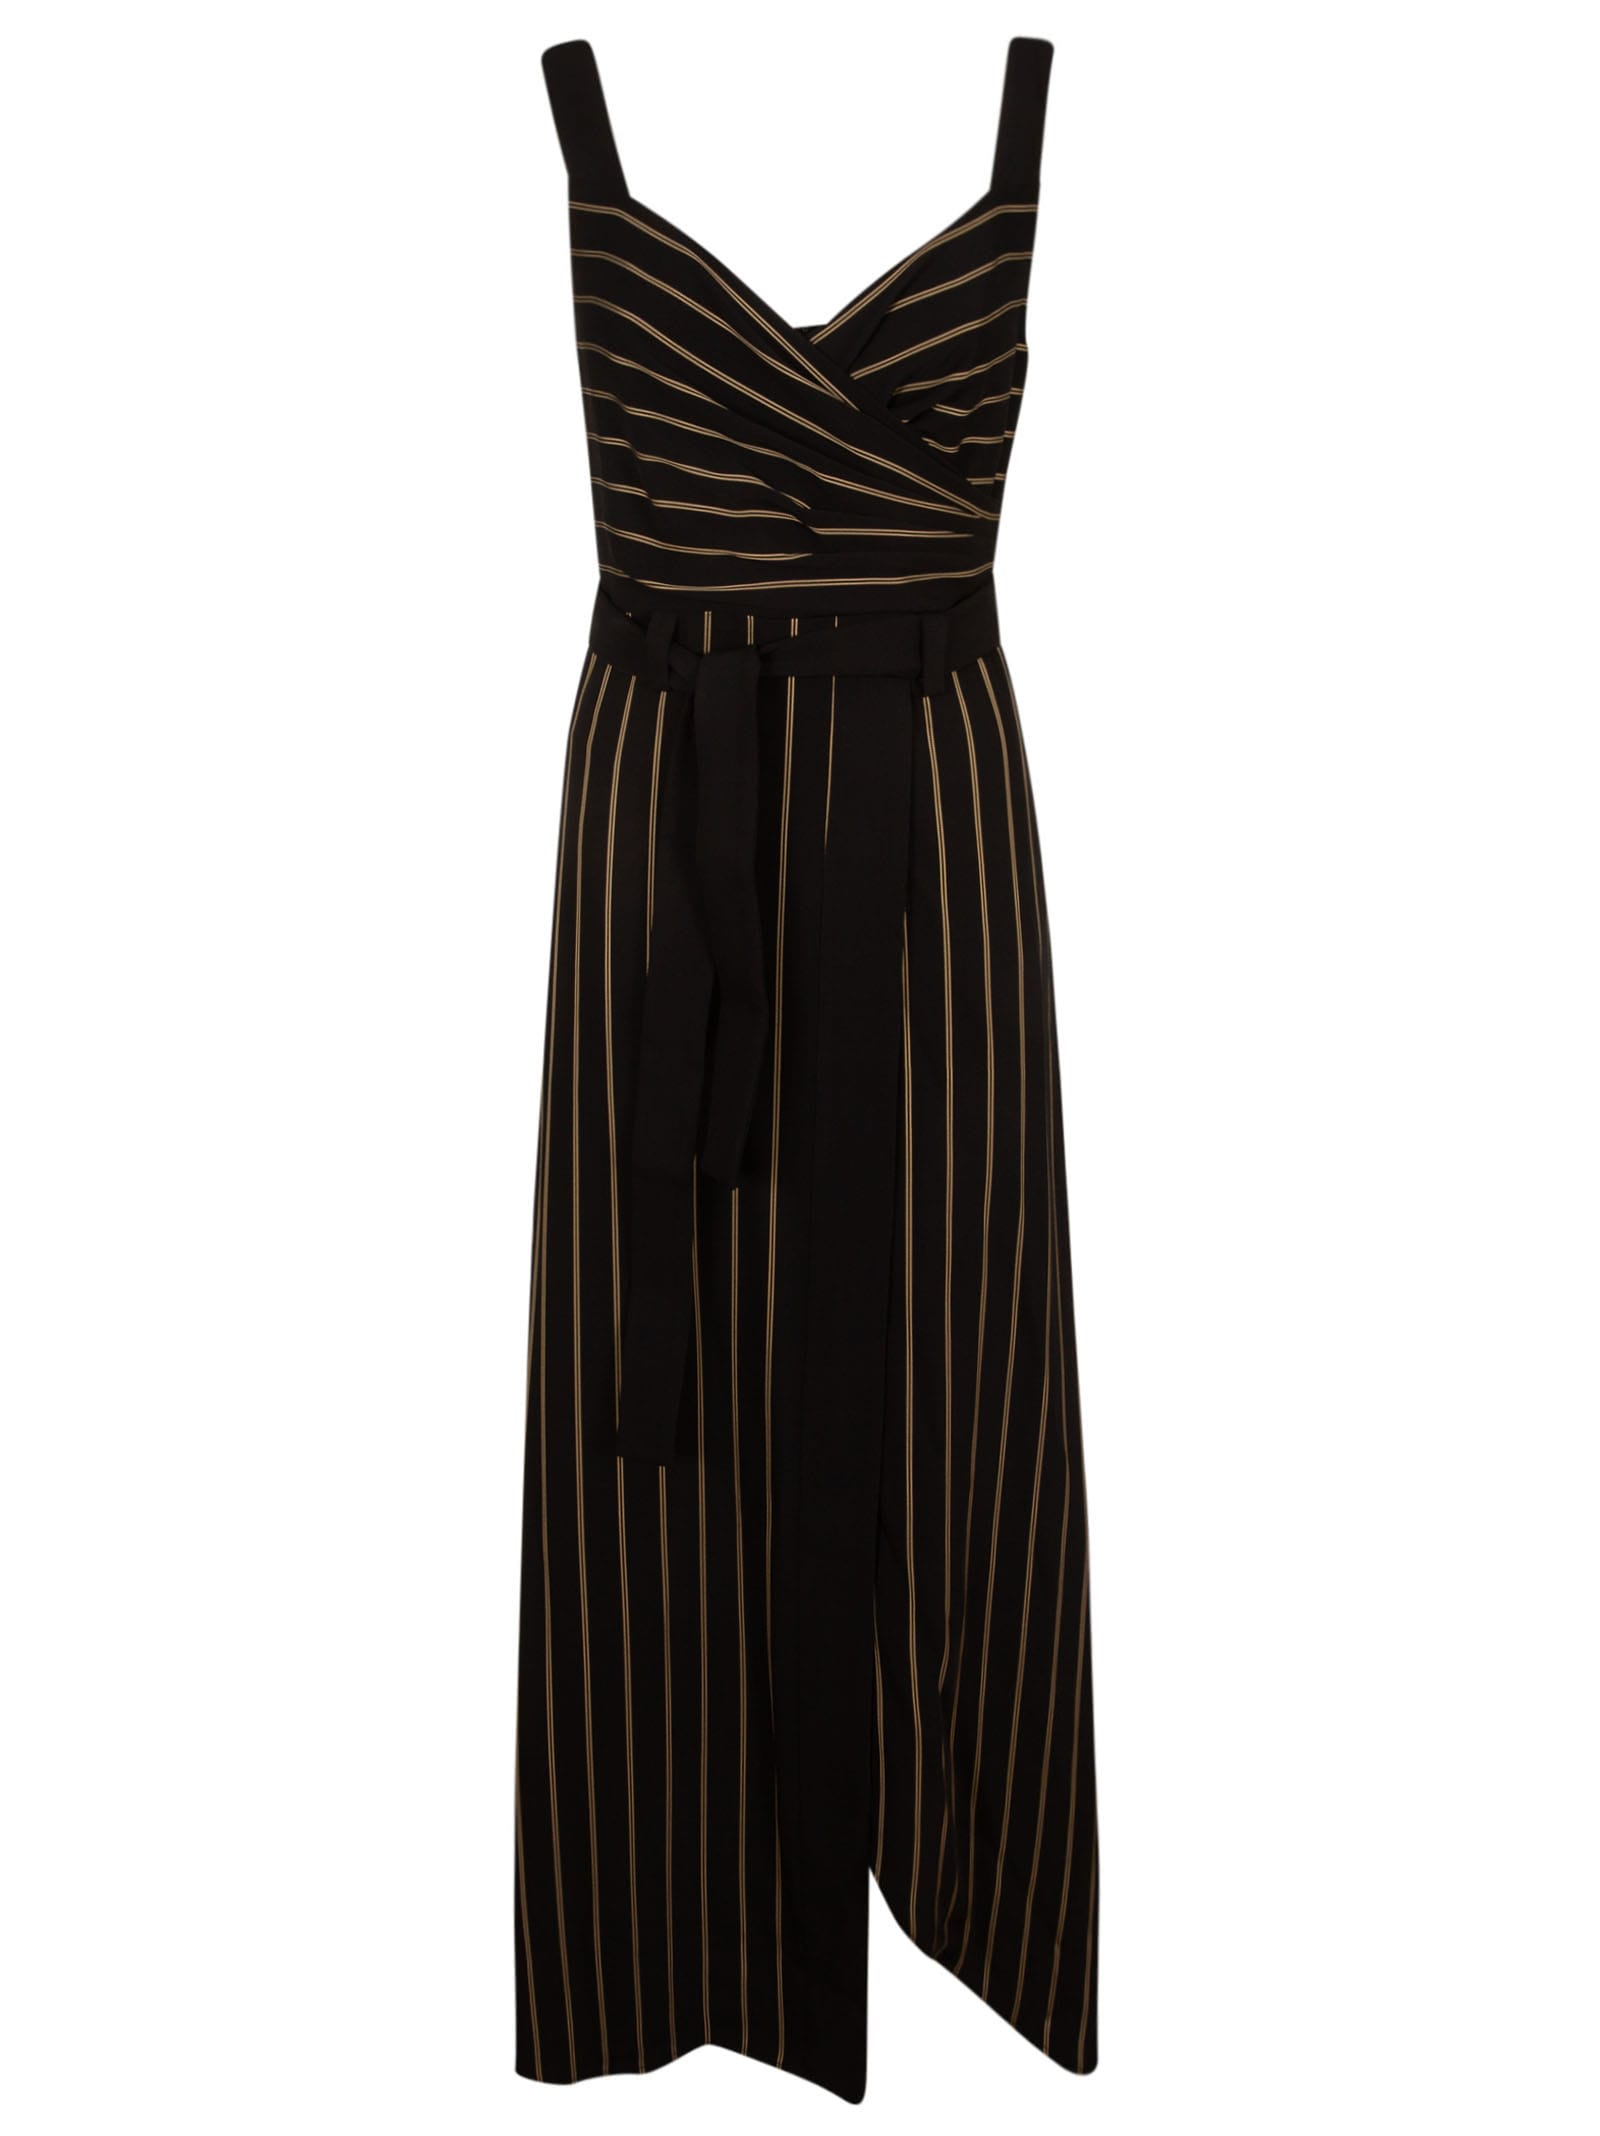 Buy Emporio Armani Sleeveless Striped Maxi Dress online, shop Emporio Armani with free shipping